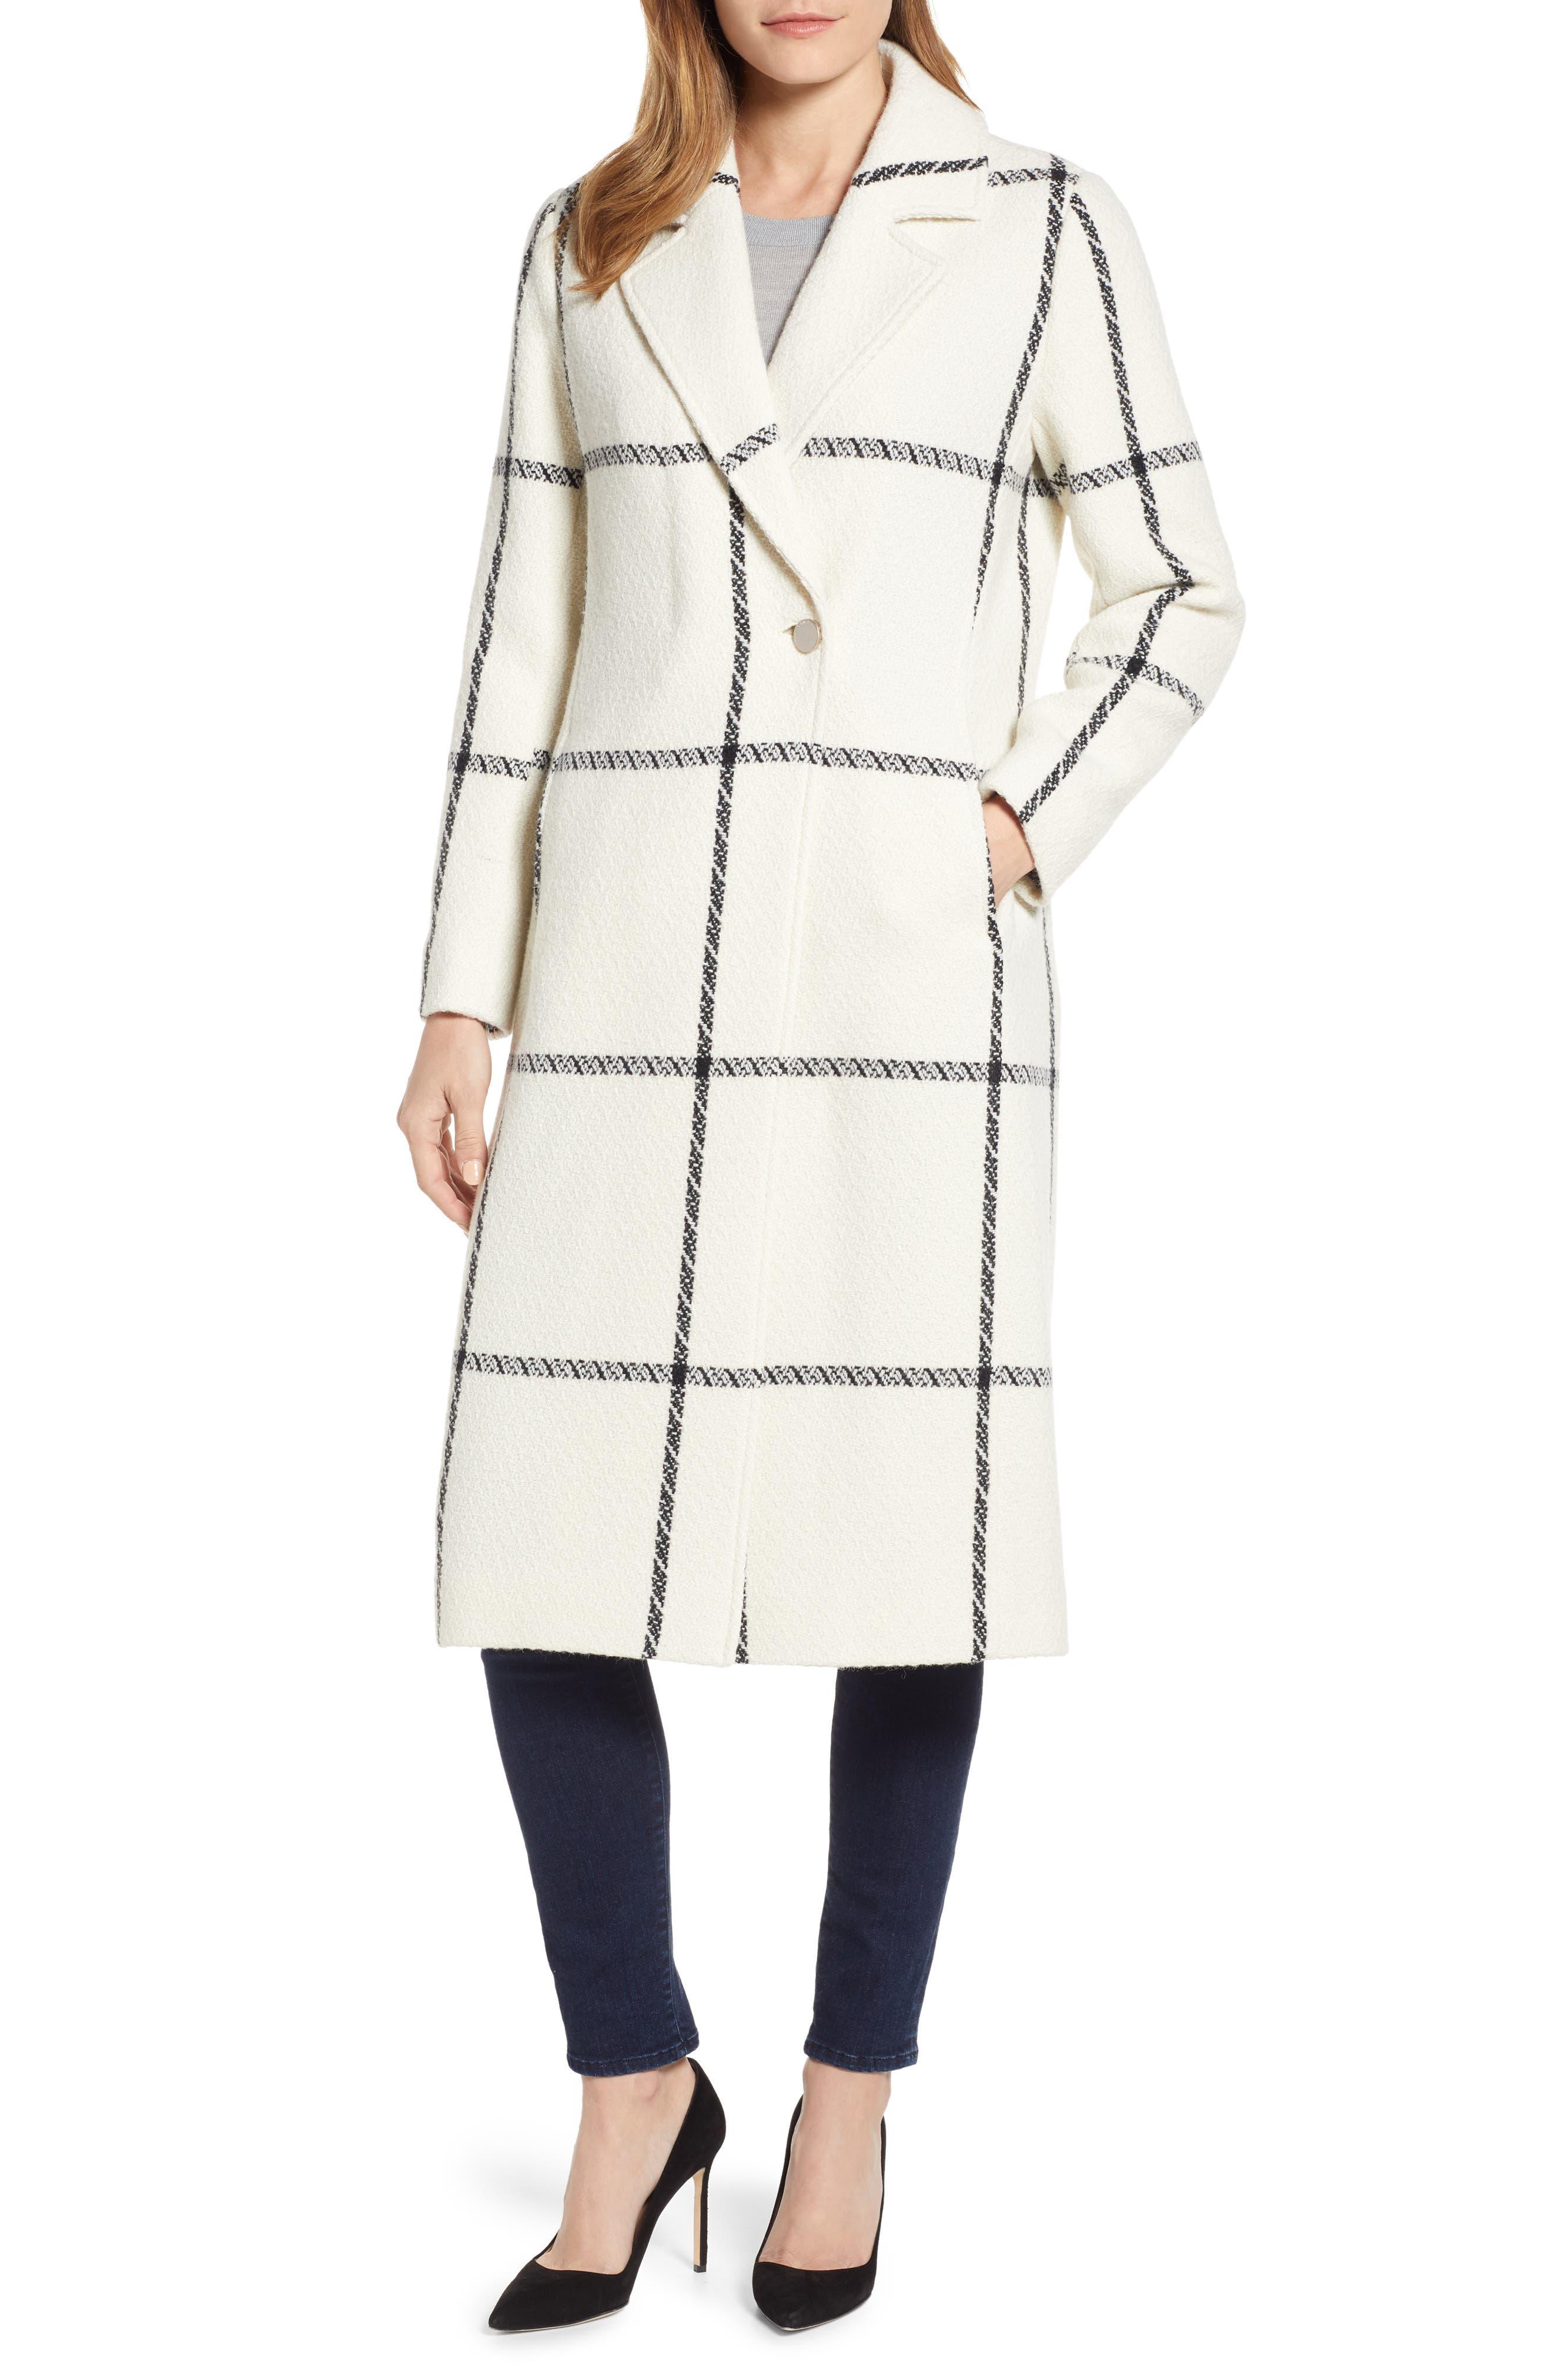 TED BAKER LONDON Soniq Check Wool Blend Long Coat, Main, color, 92-IVORY